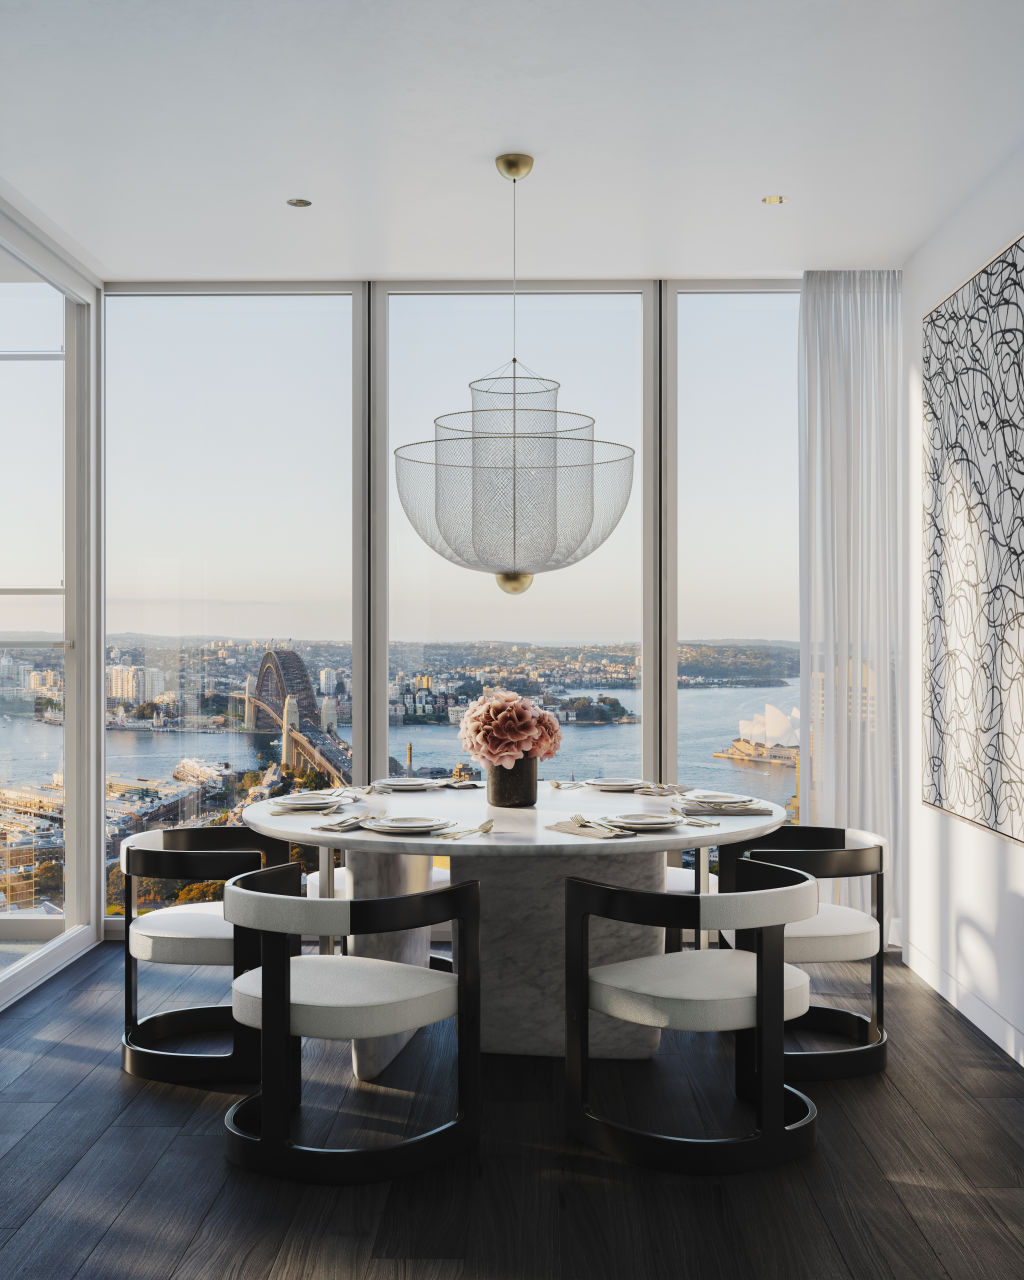 LLSY10622_One_Sydney_Harbour_ID06_Dining_Signature_Scheme_High_Res_xlwn8t